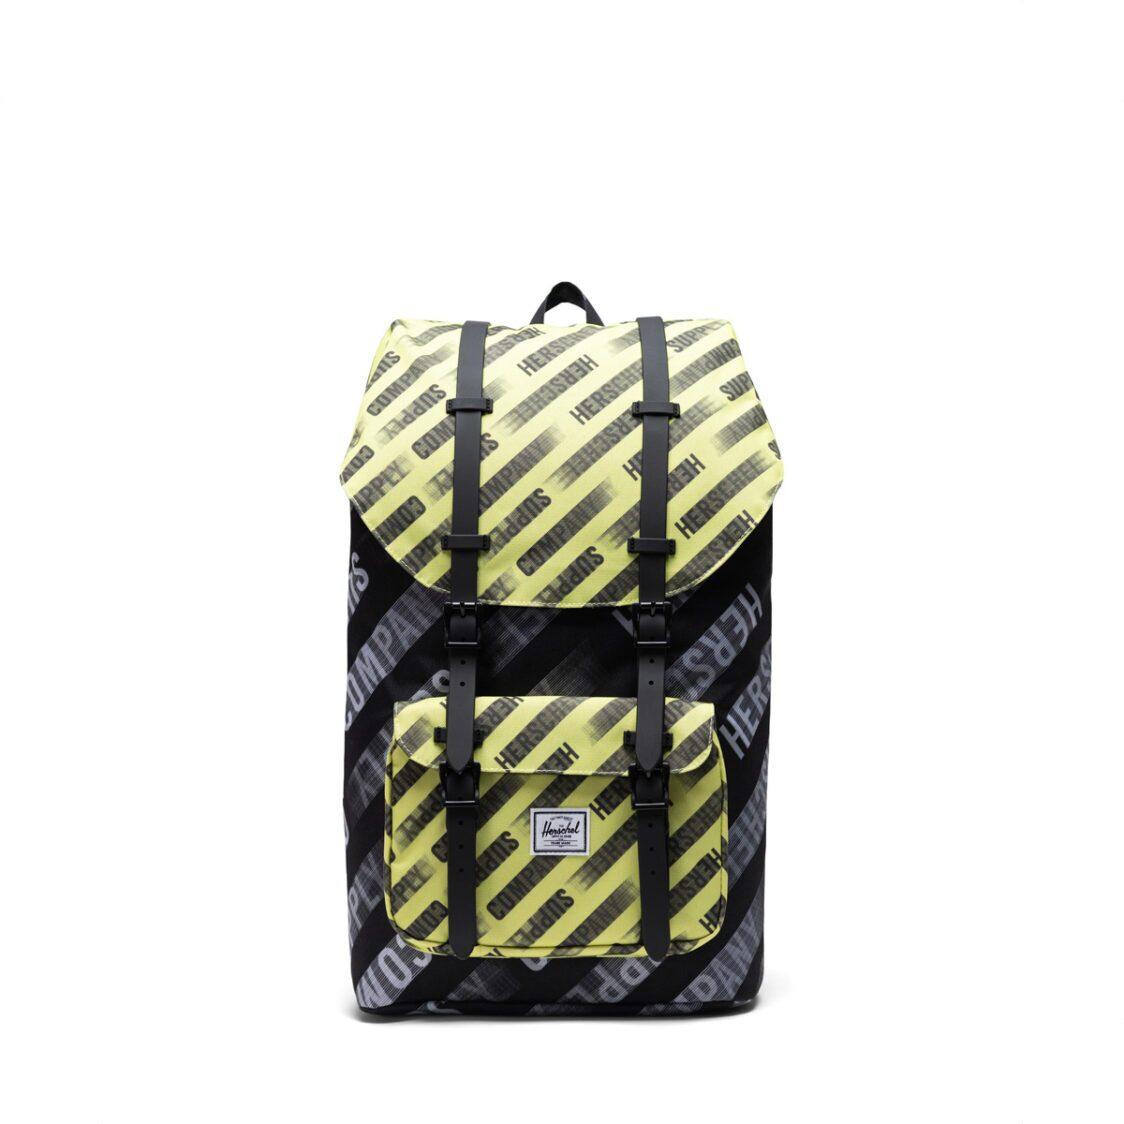 Herschel Little America Motion BlackHighlight Backpack 10014-04485-OS